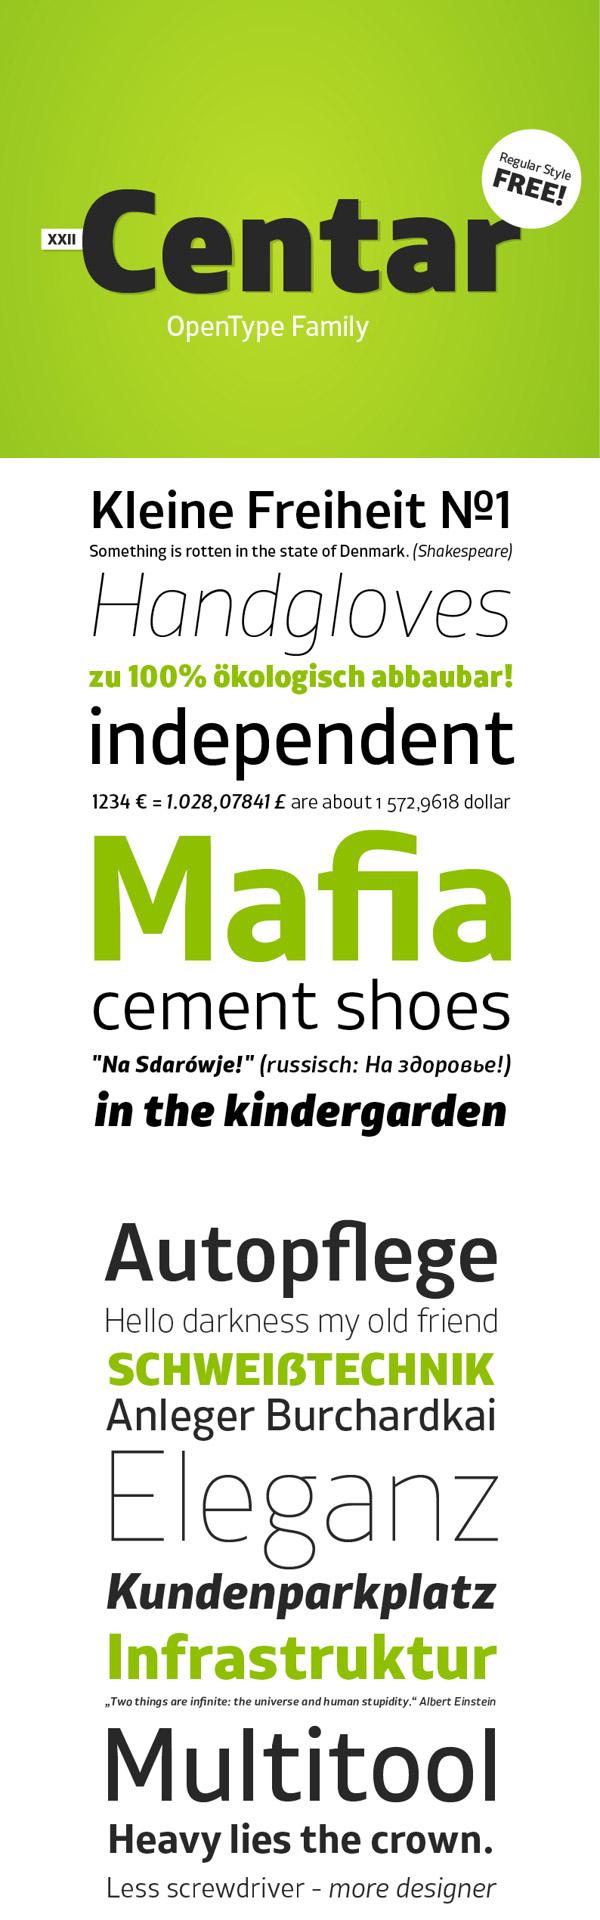 XXII Centar Sans - Free Font